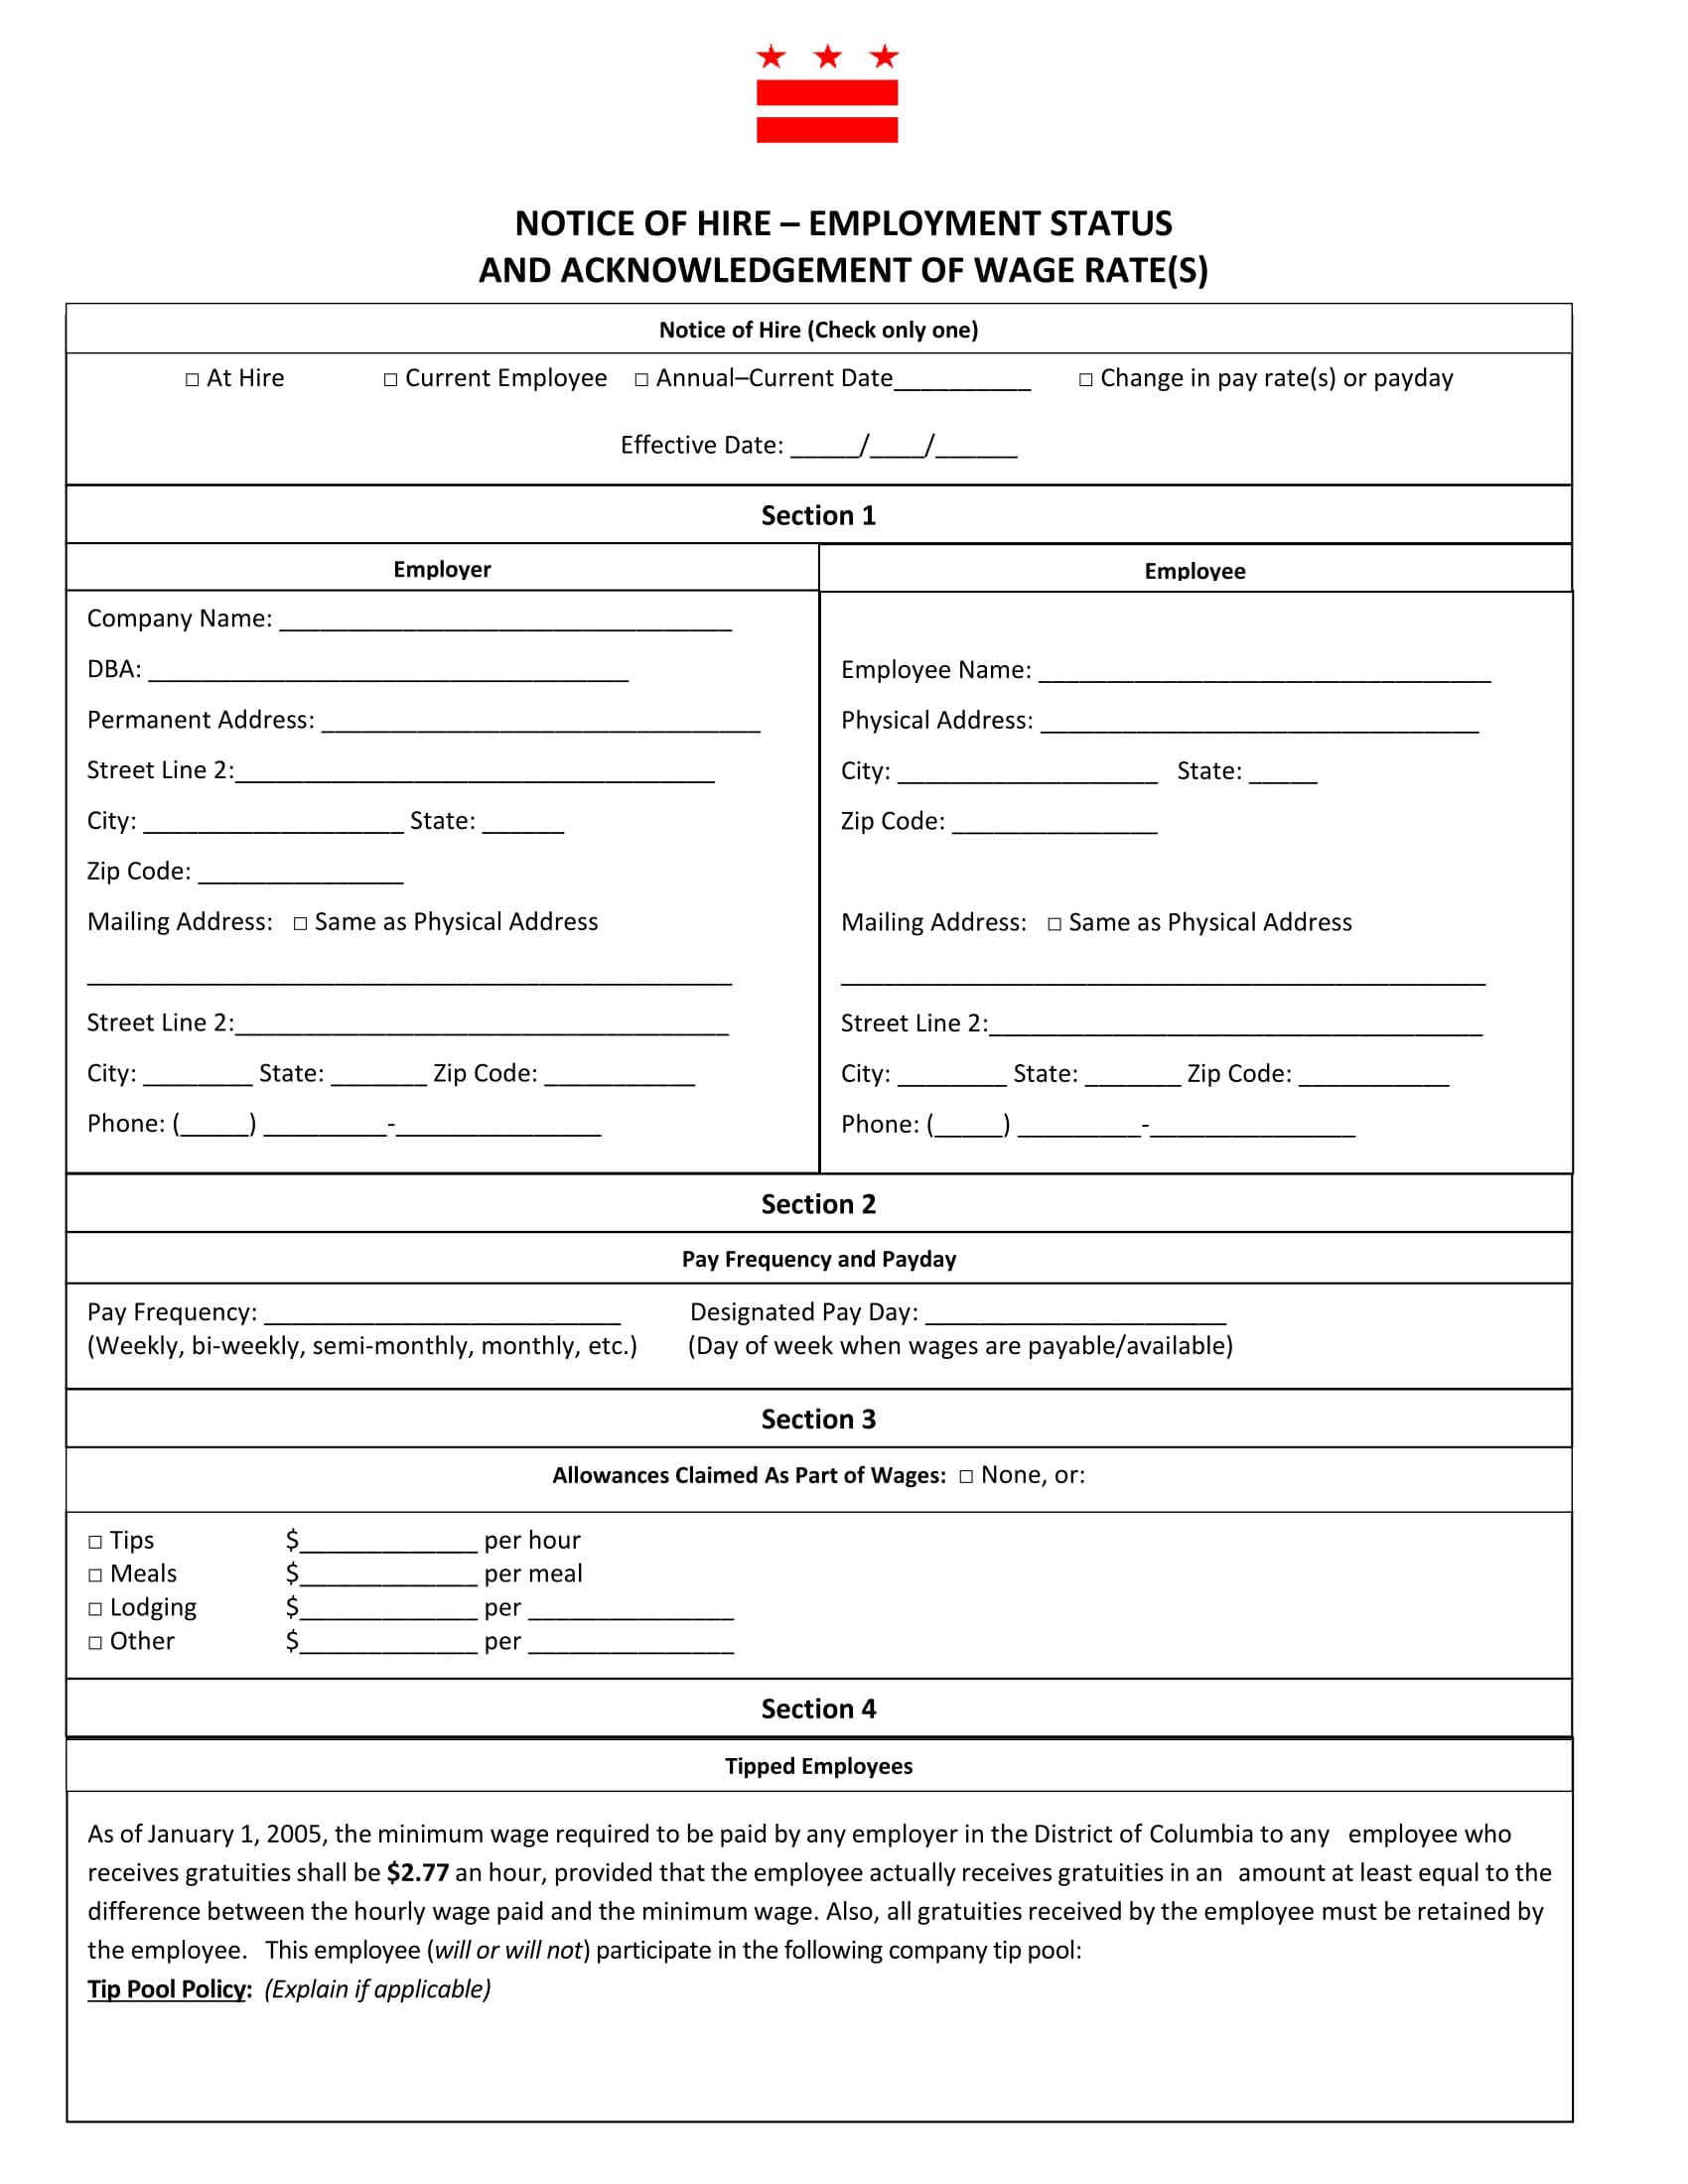 notice of job hiring form 1